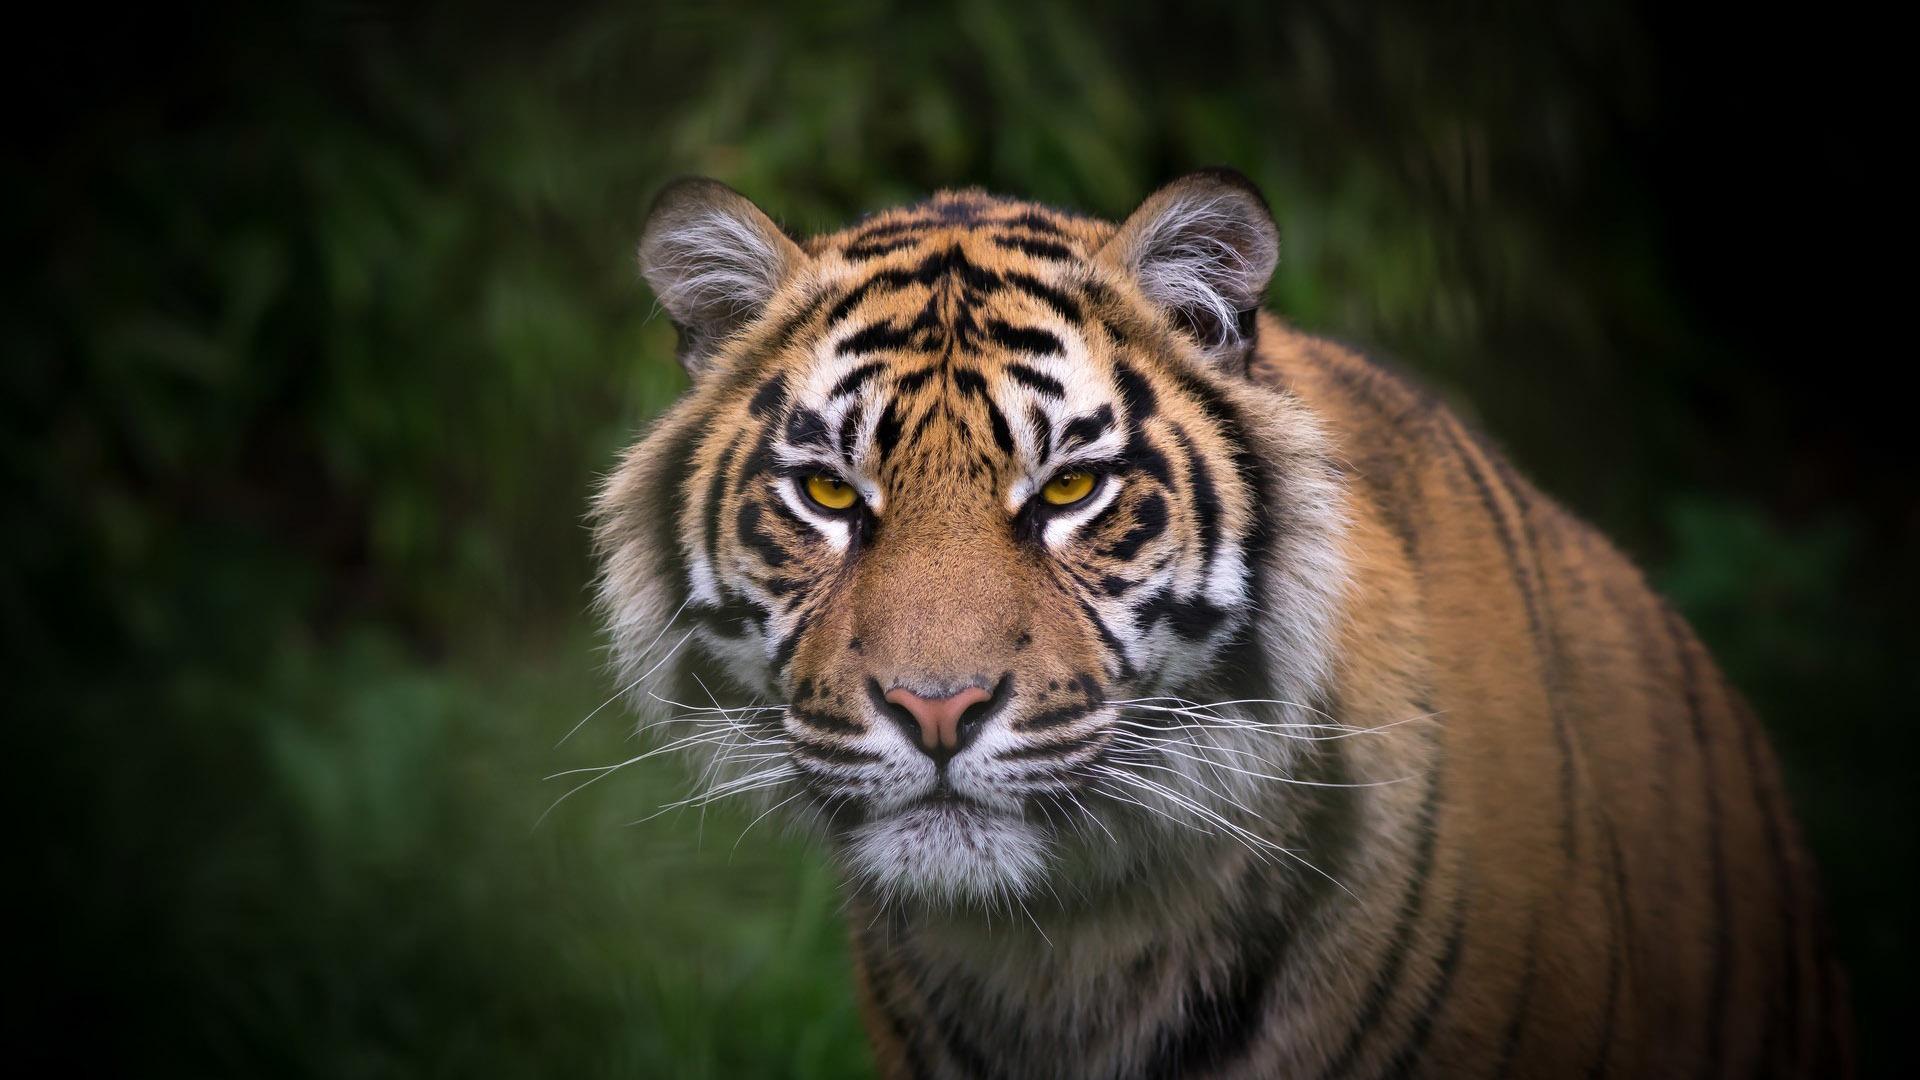 tiger wallpaper widescreen - photo #6